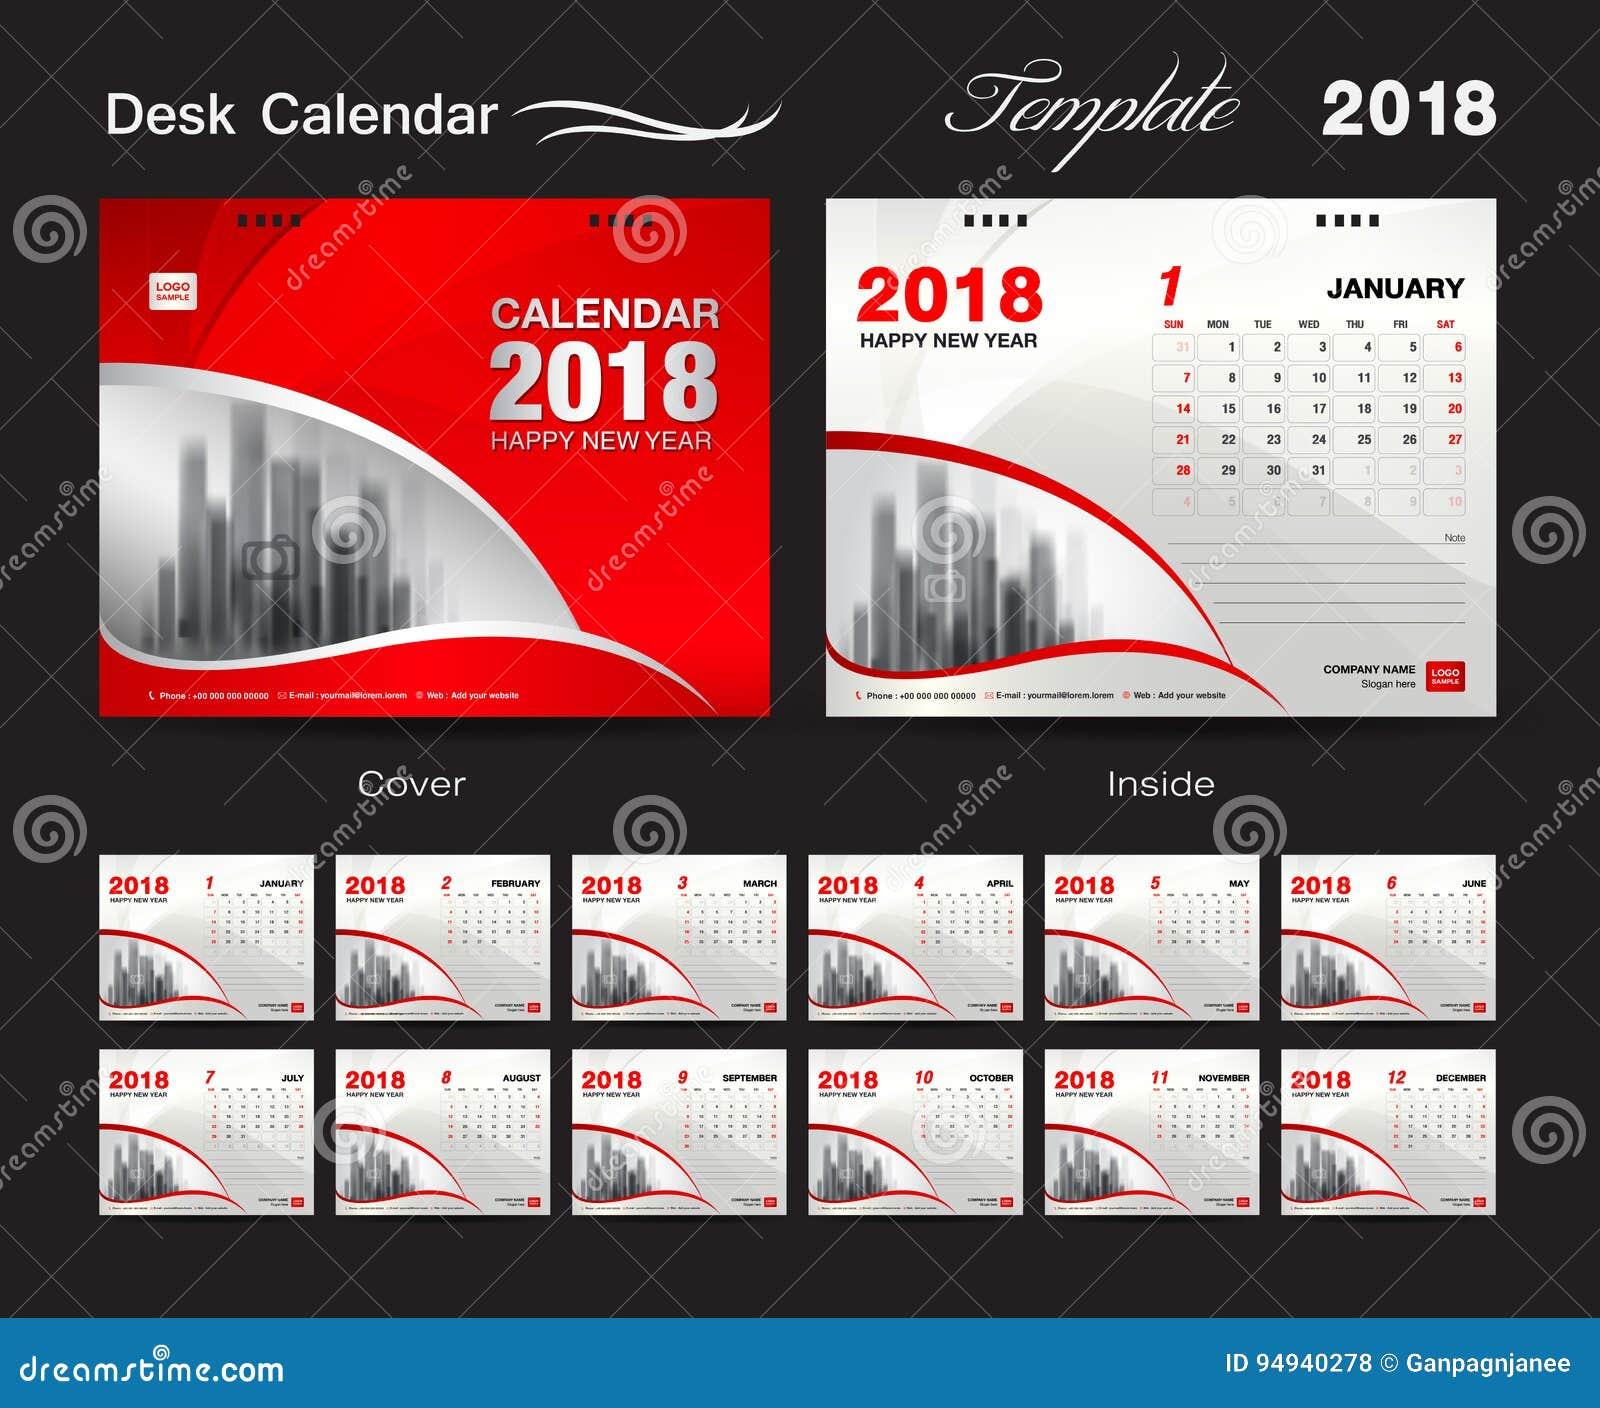 Calendar Design Software Free Download : Desk calendar template design red cover set of